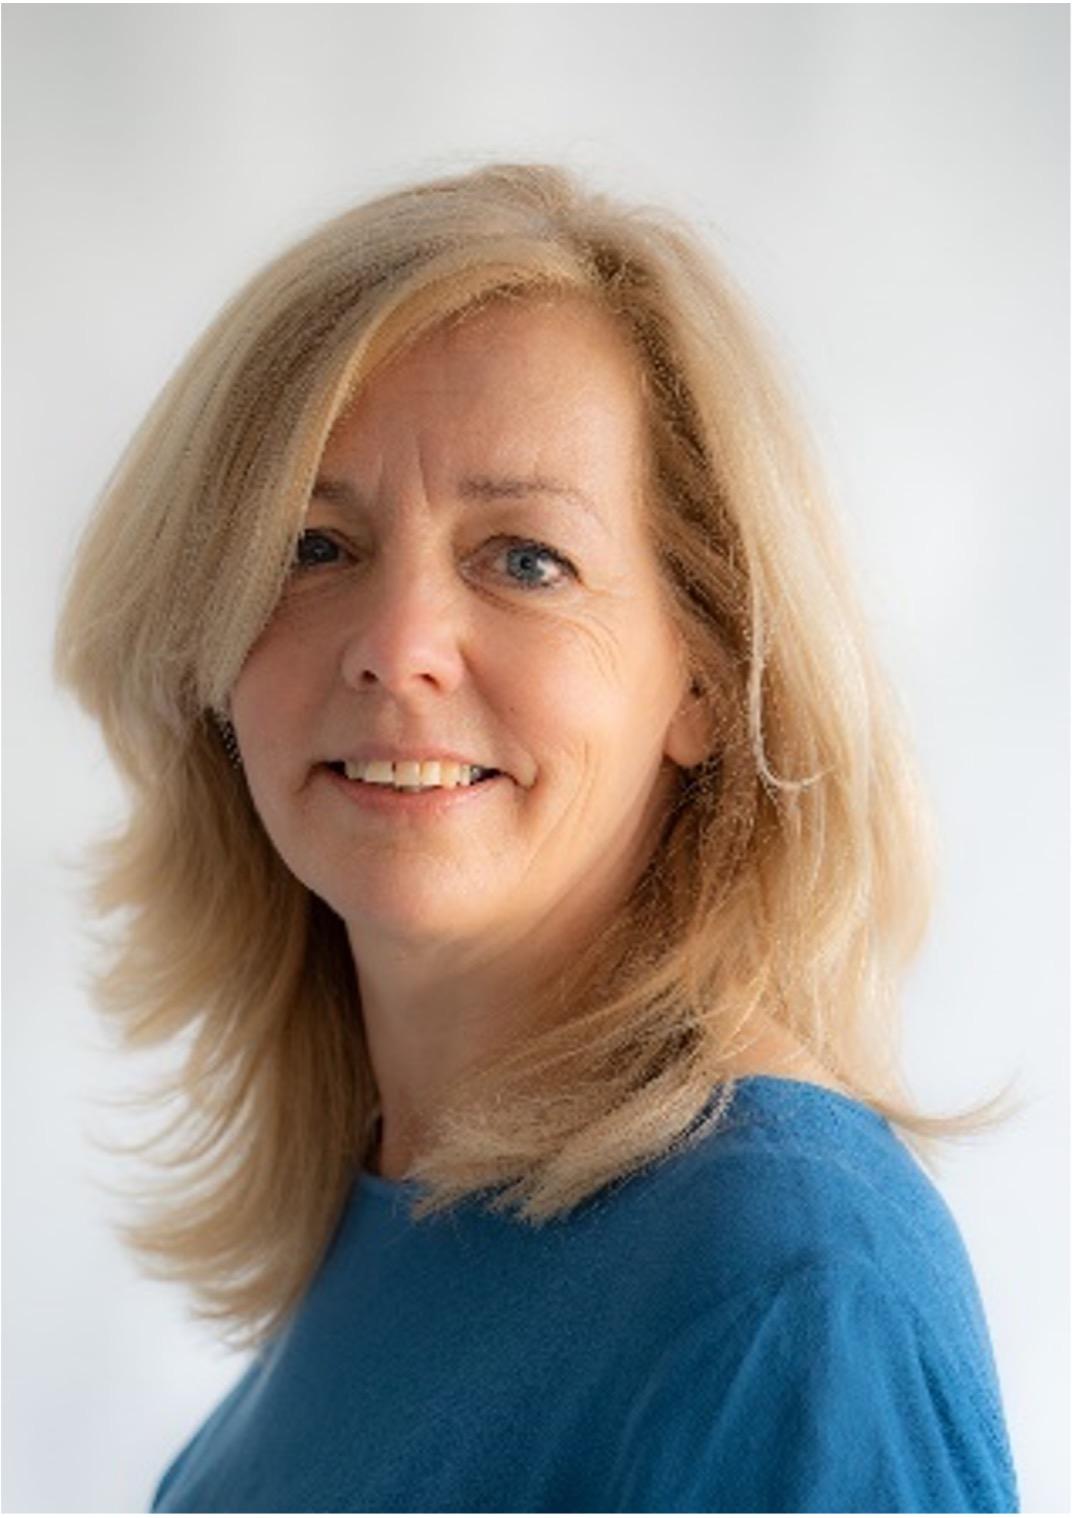 Wilma Meijnders